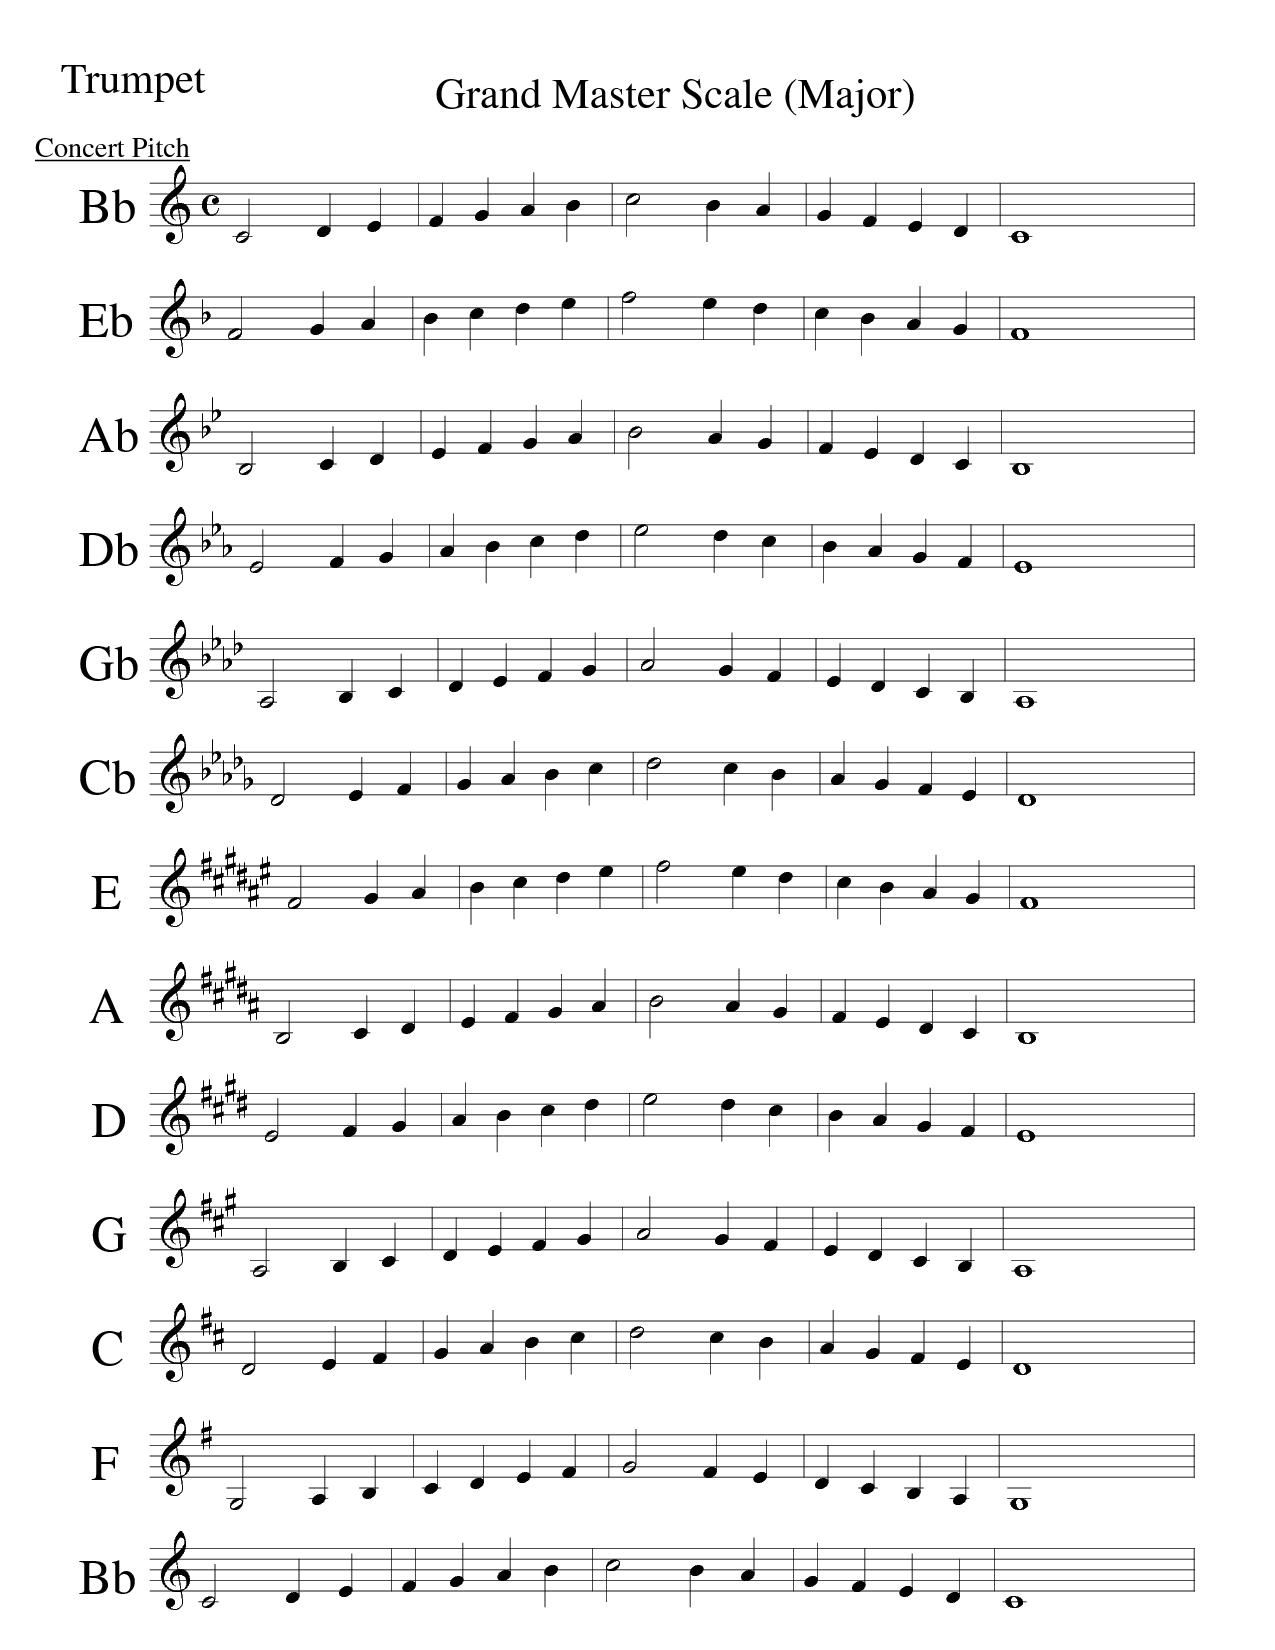 Trumpet Major Scales in Concert   Finale 2000b - [Trumpet Major ...